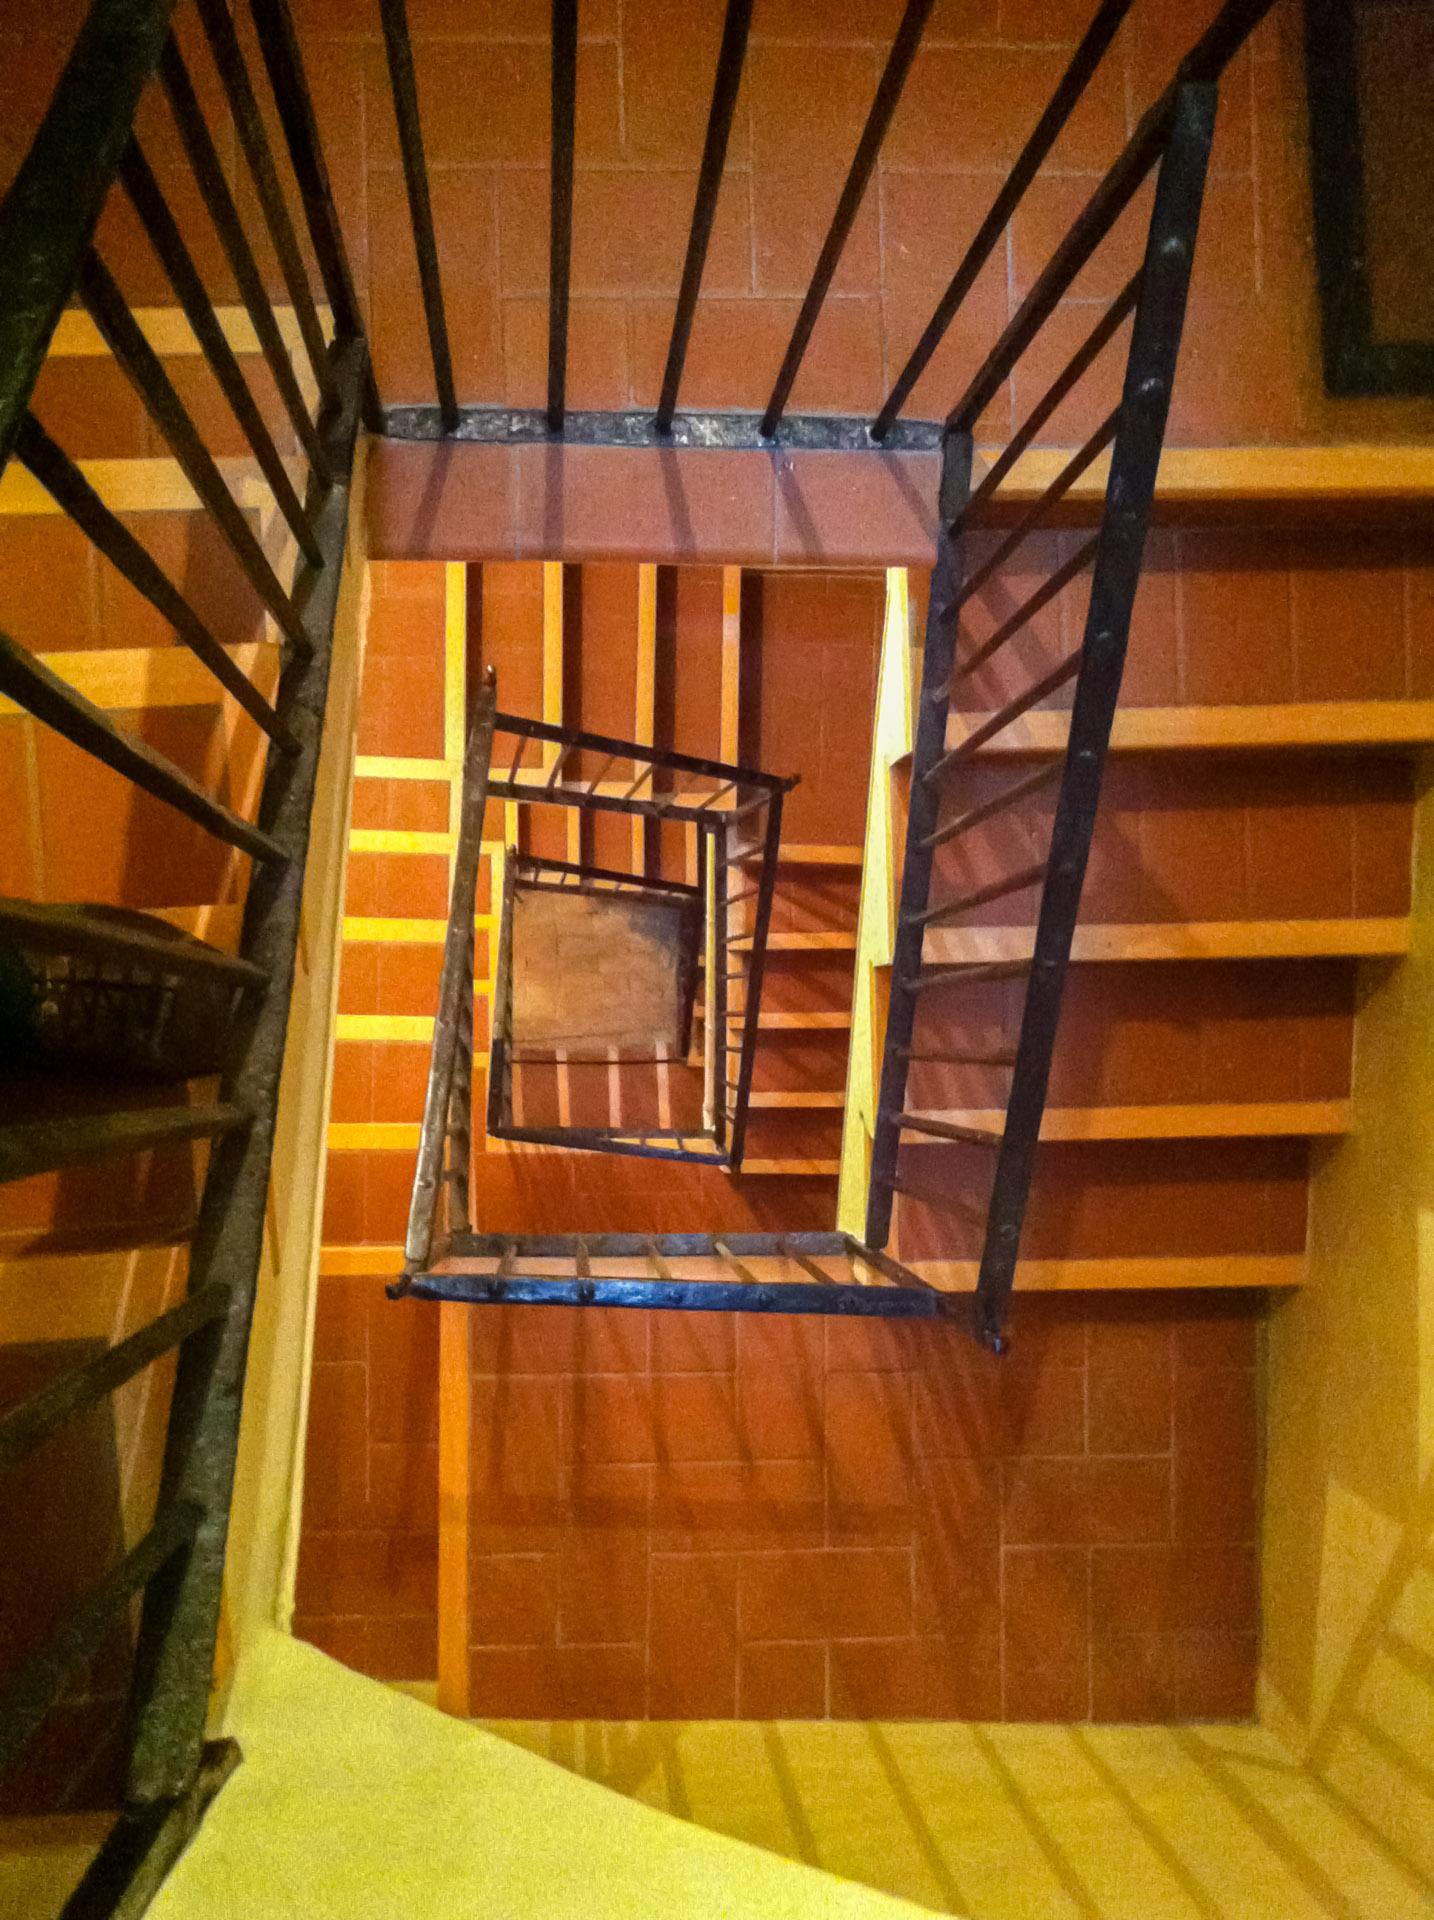 Escalera interior 01